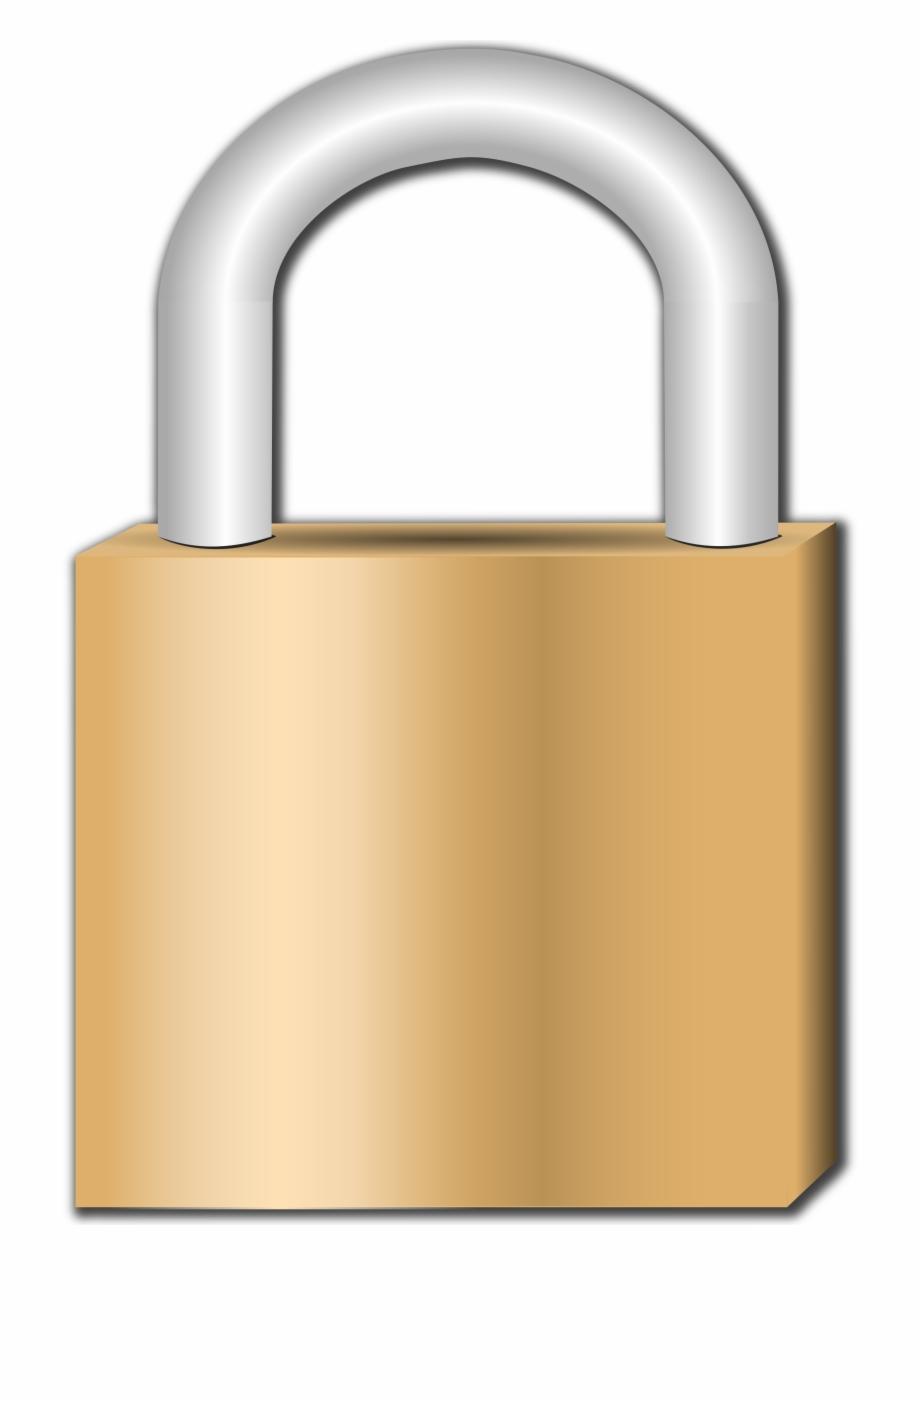 Lock clipart big. Transparent padlock hd png